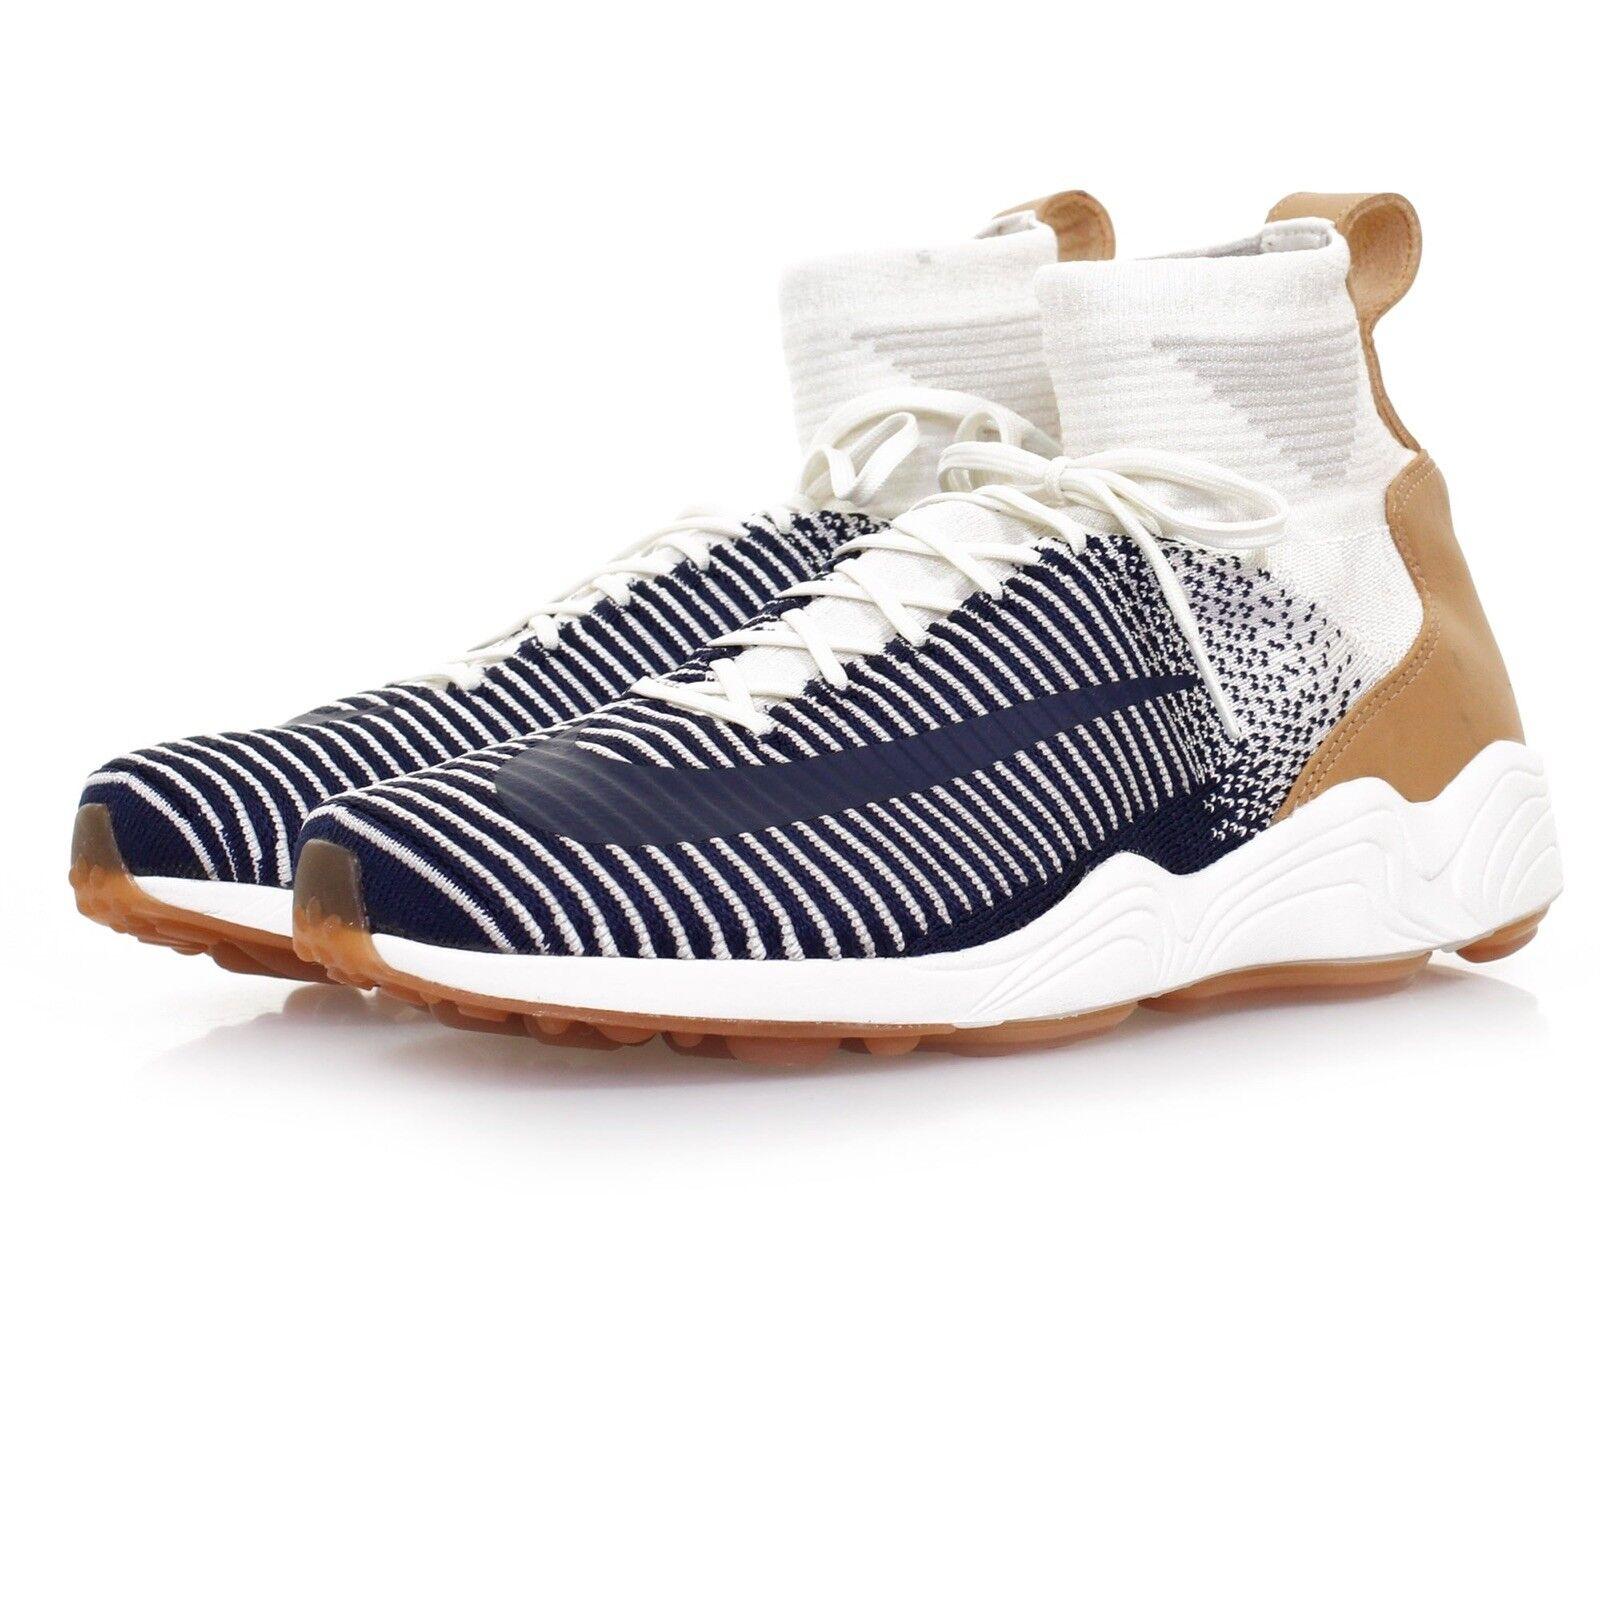 Nike Zoom Mercurial XI FK Flyknit Sail White Navy bluee  844626-101 Mens 9